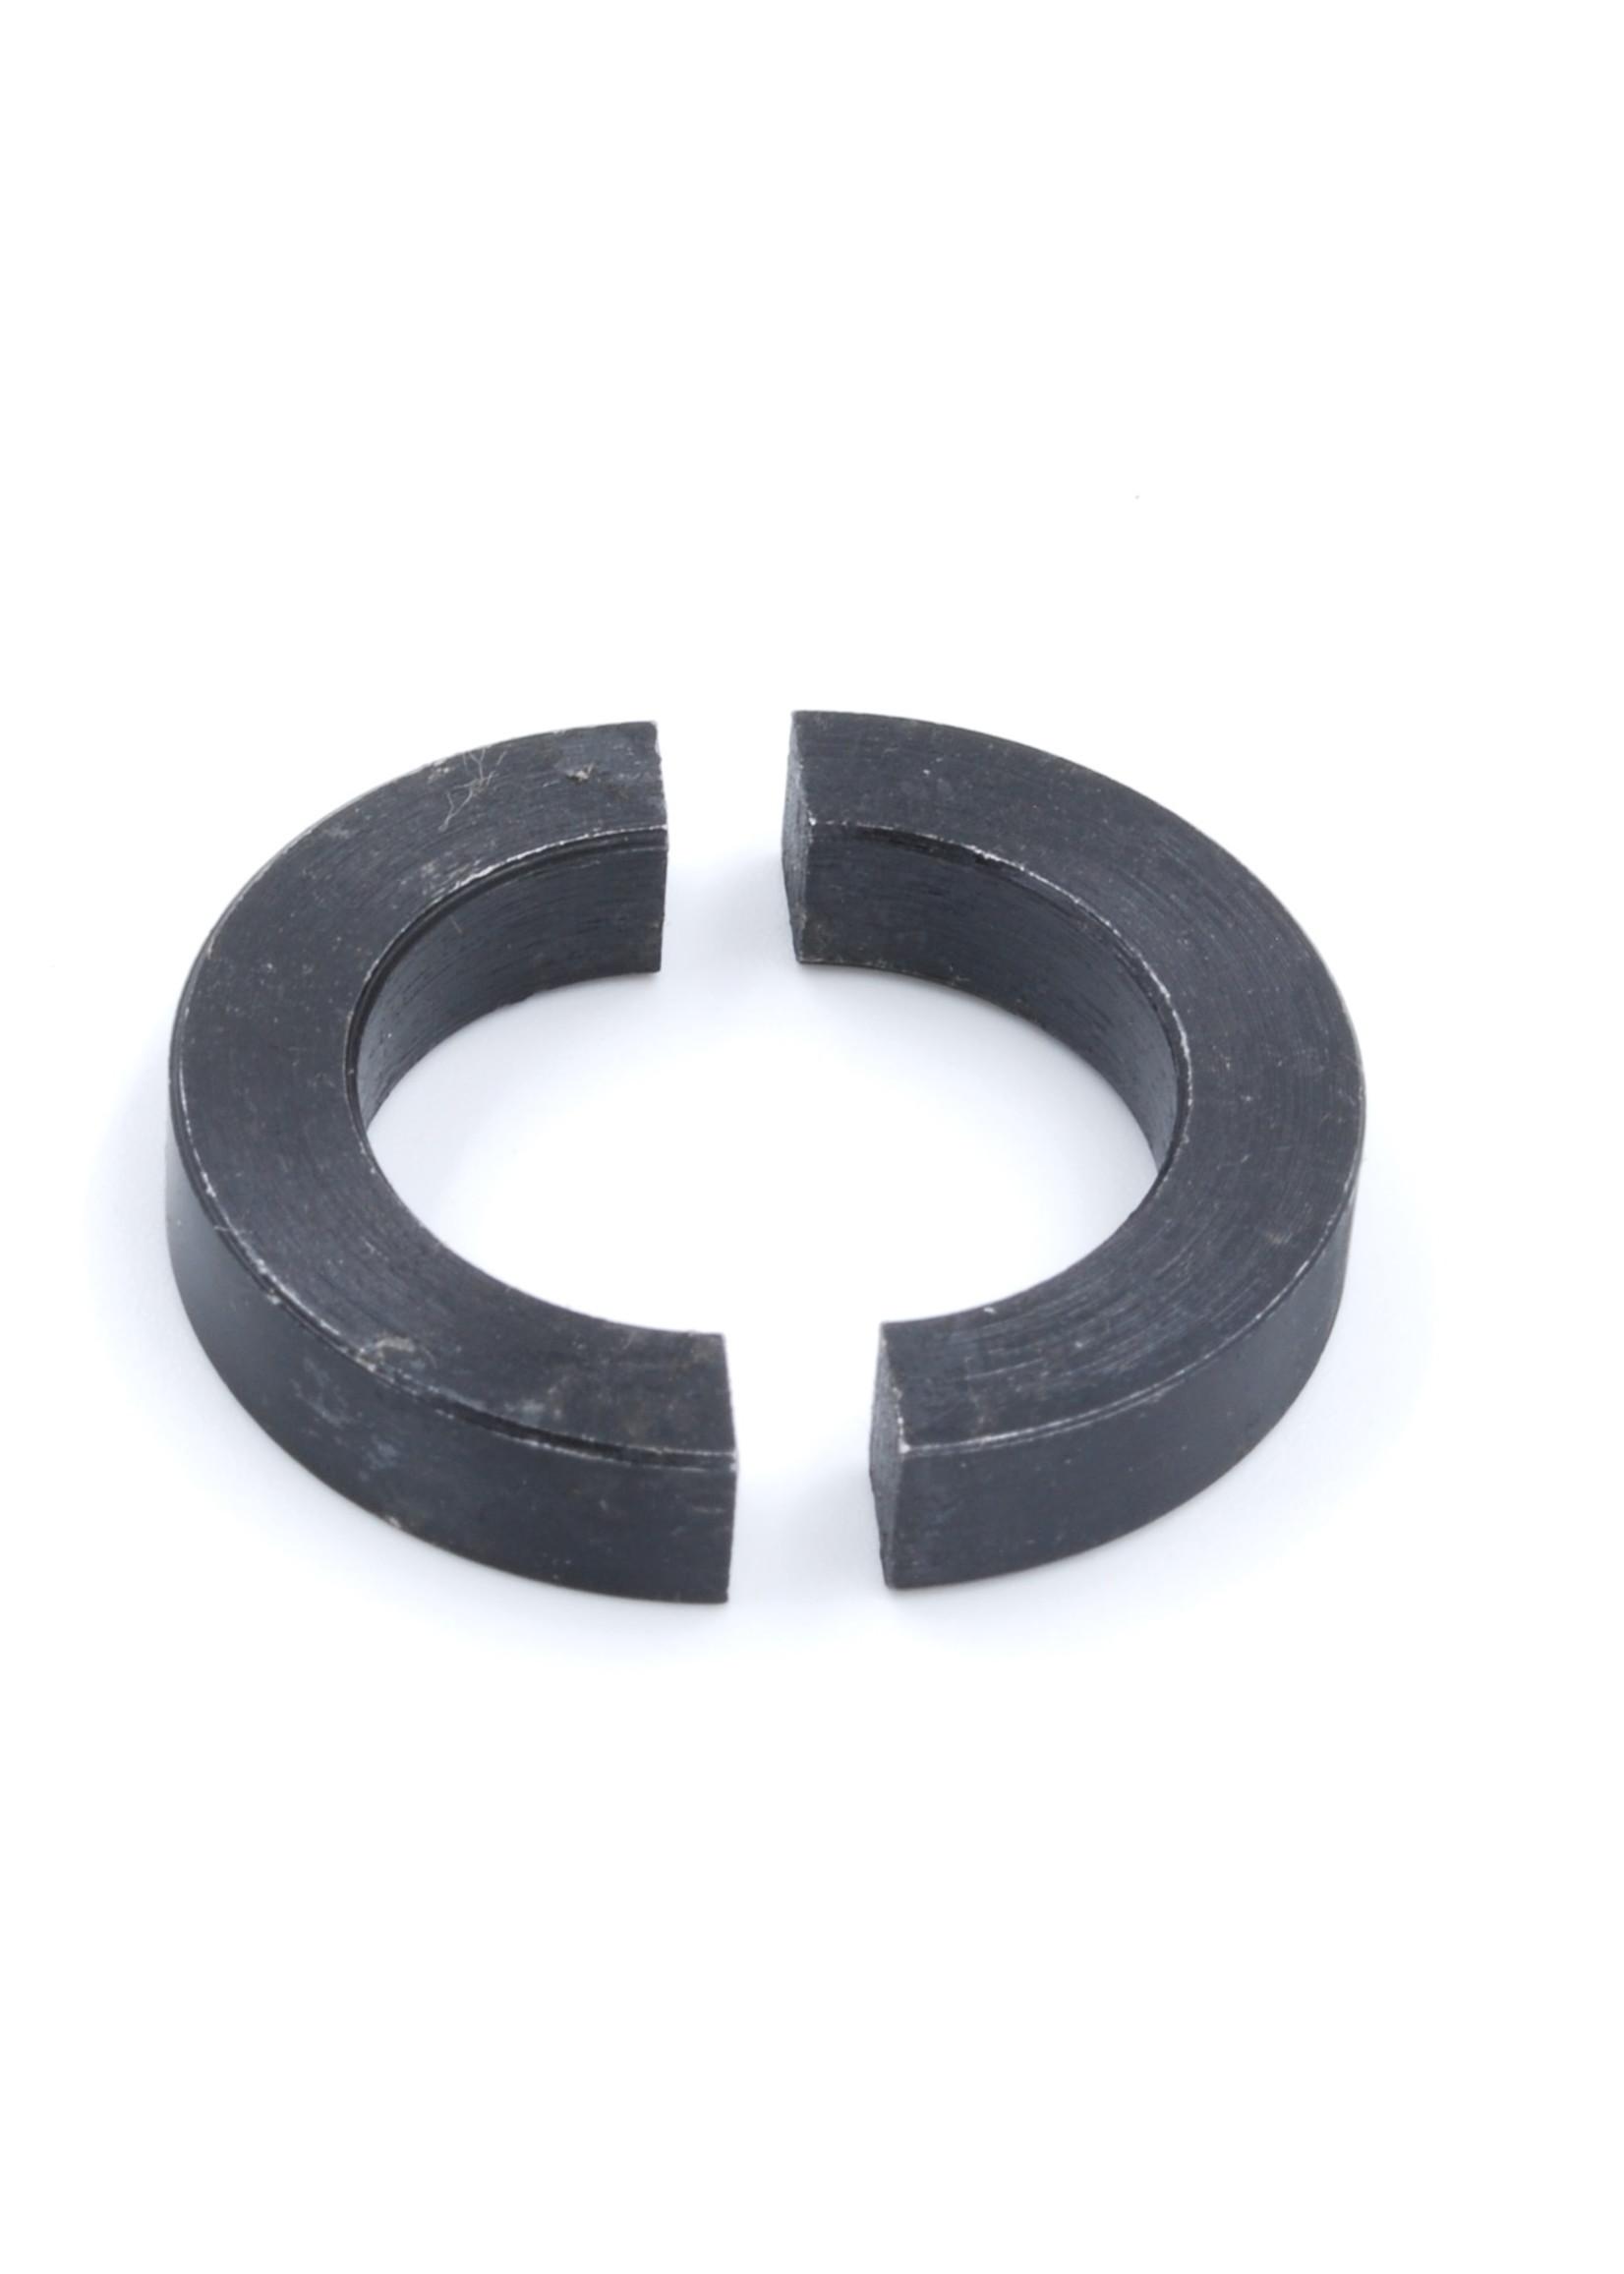 MP40 Split Collar Nut Ring